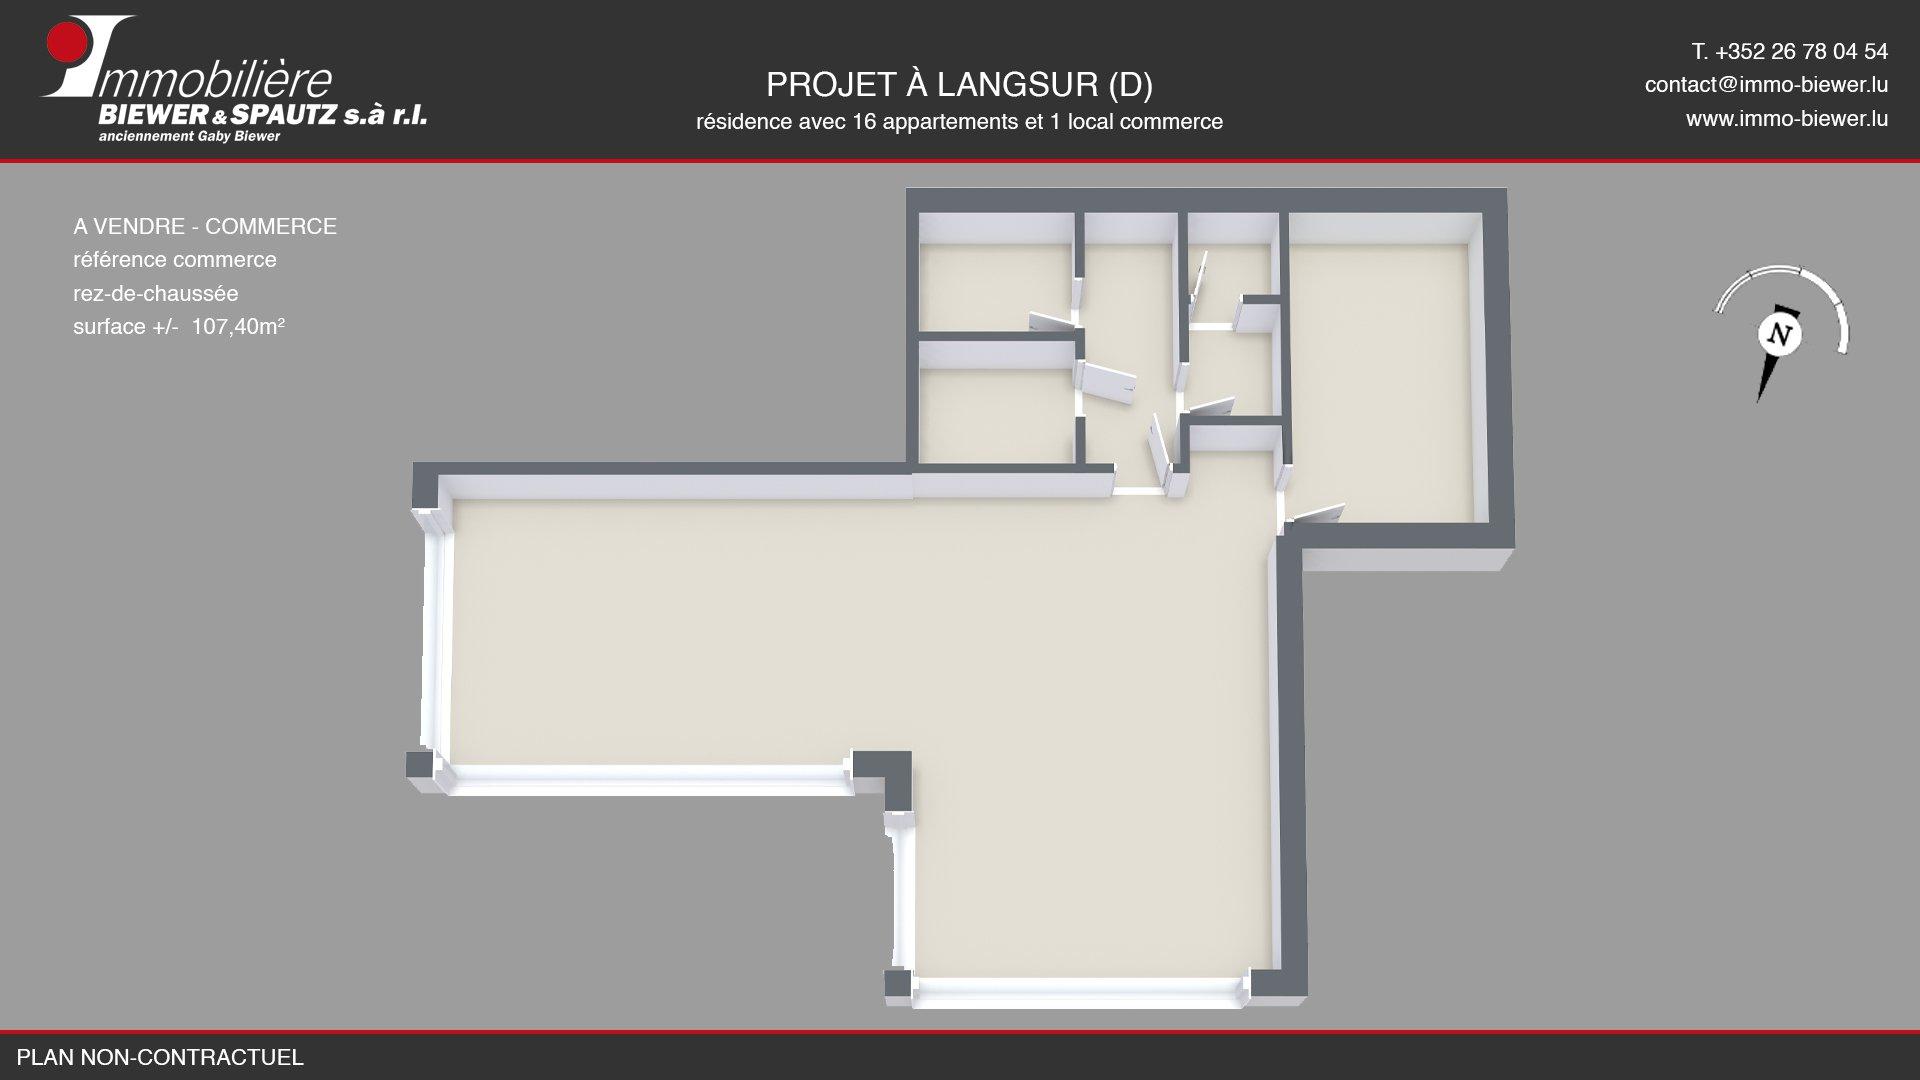 Sale Business - Langsur - Germany